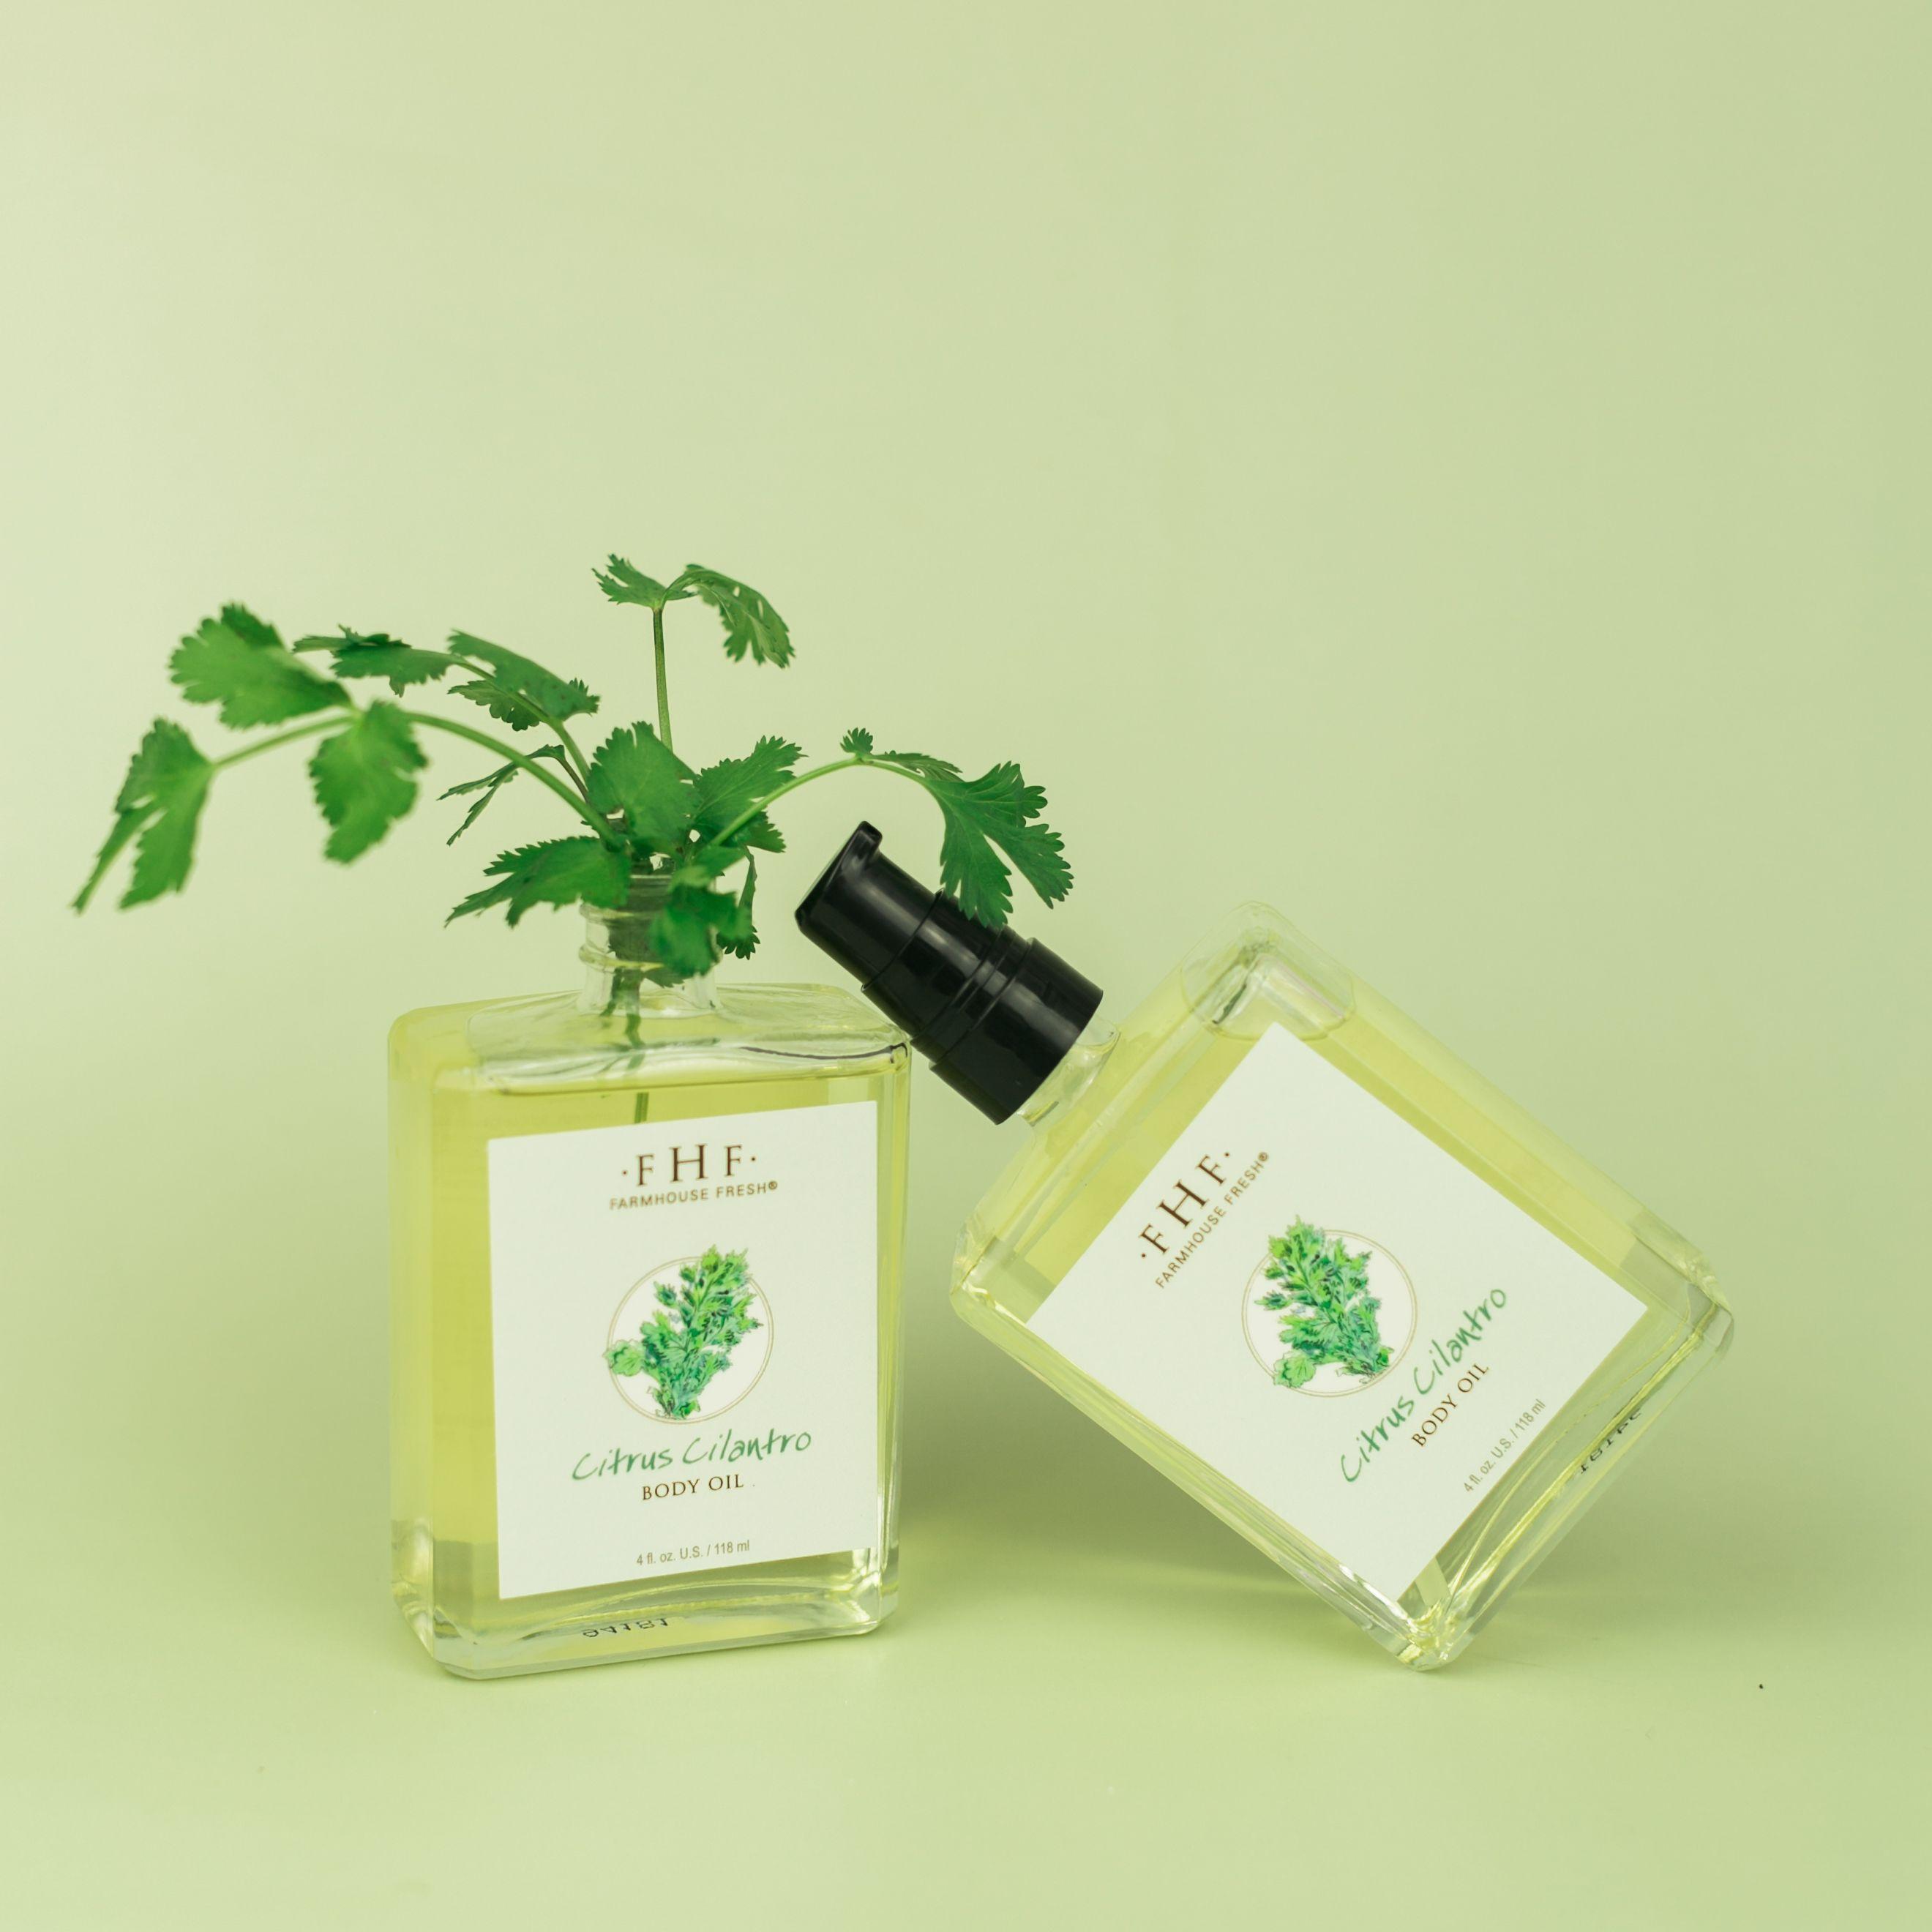 Citrus Cilantro Body Oil in 2020 Olive fruit, Cilantro